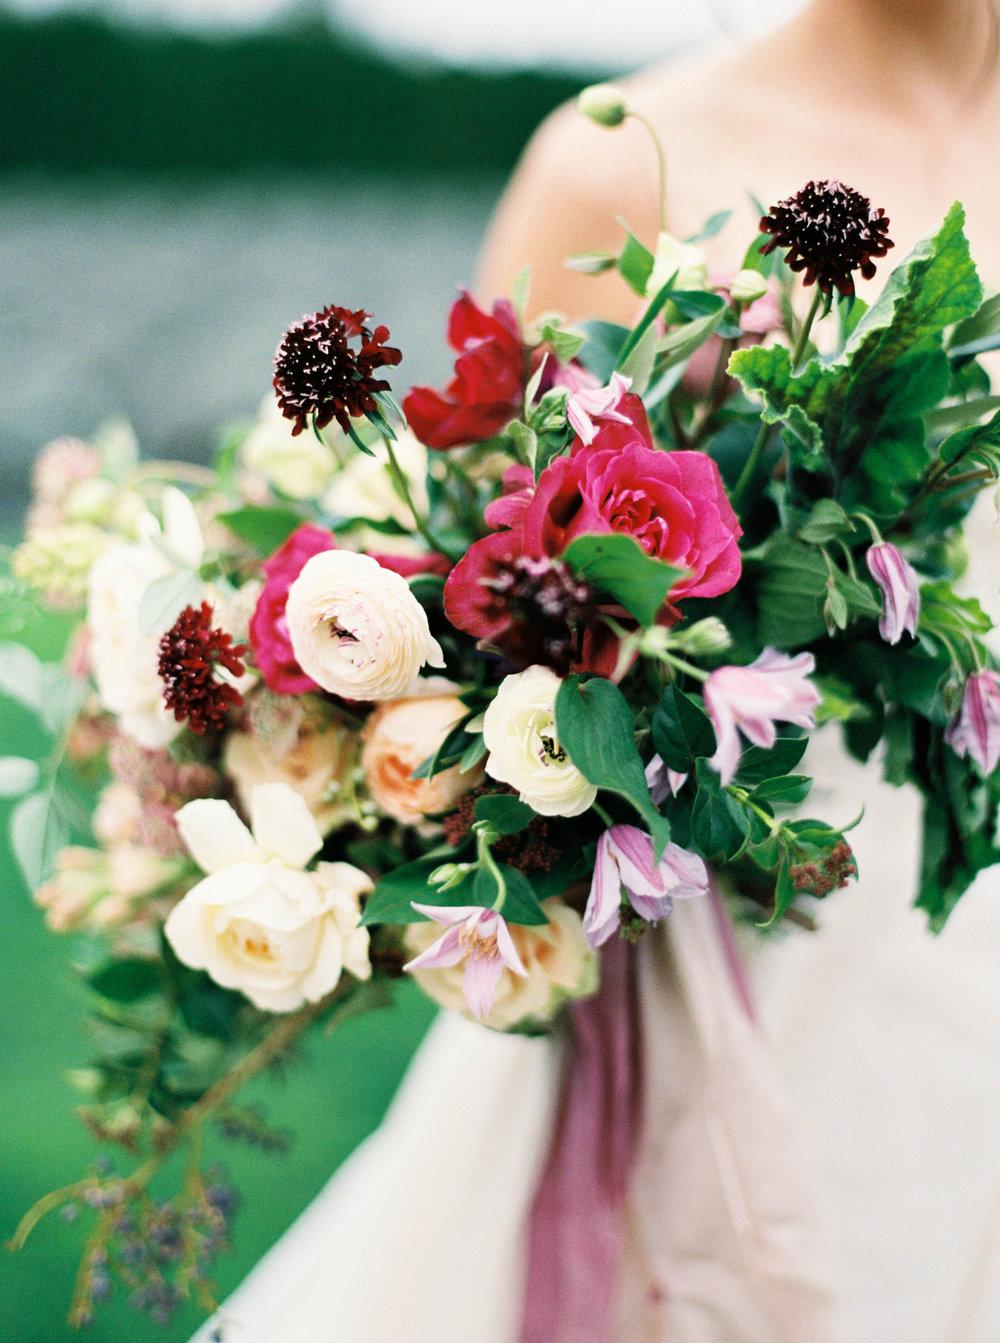 purple pink and white wedding bouquet.JPG